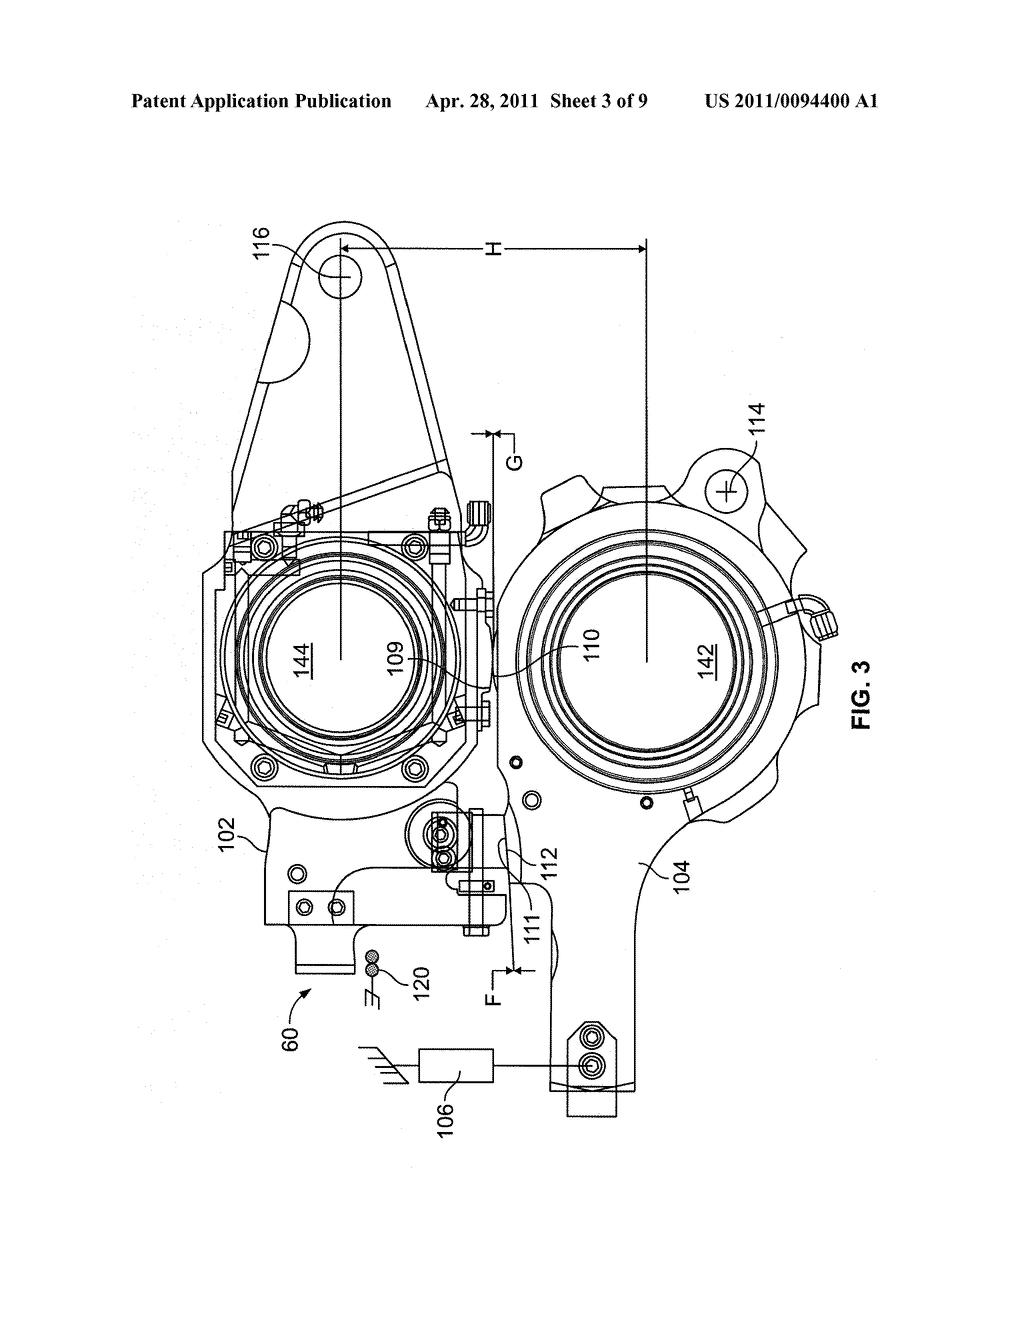 web offset printing press with articulated tucker diagram rh patentsencyclopedia com gutenberg printing press diagram labeled offset printing press diagram